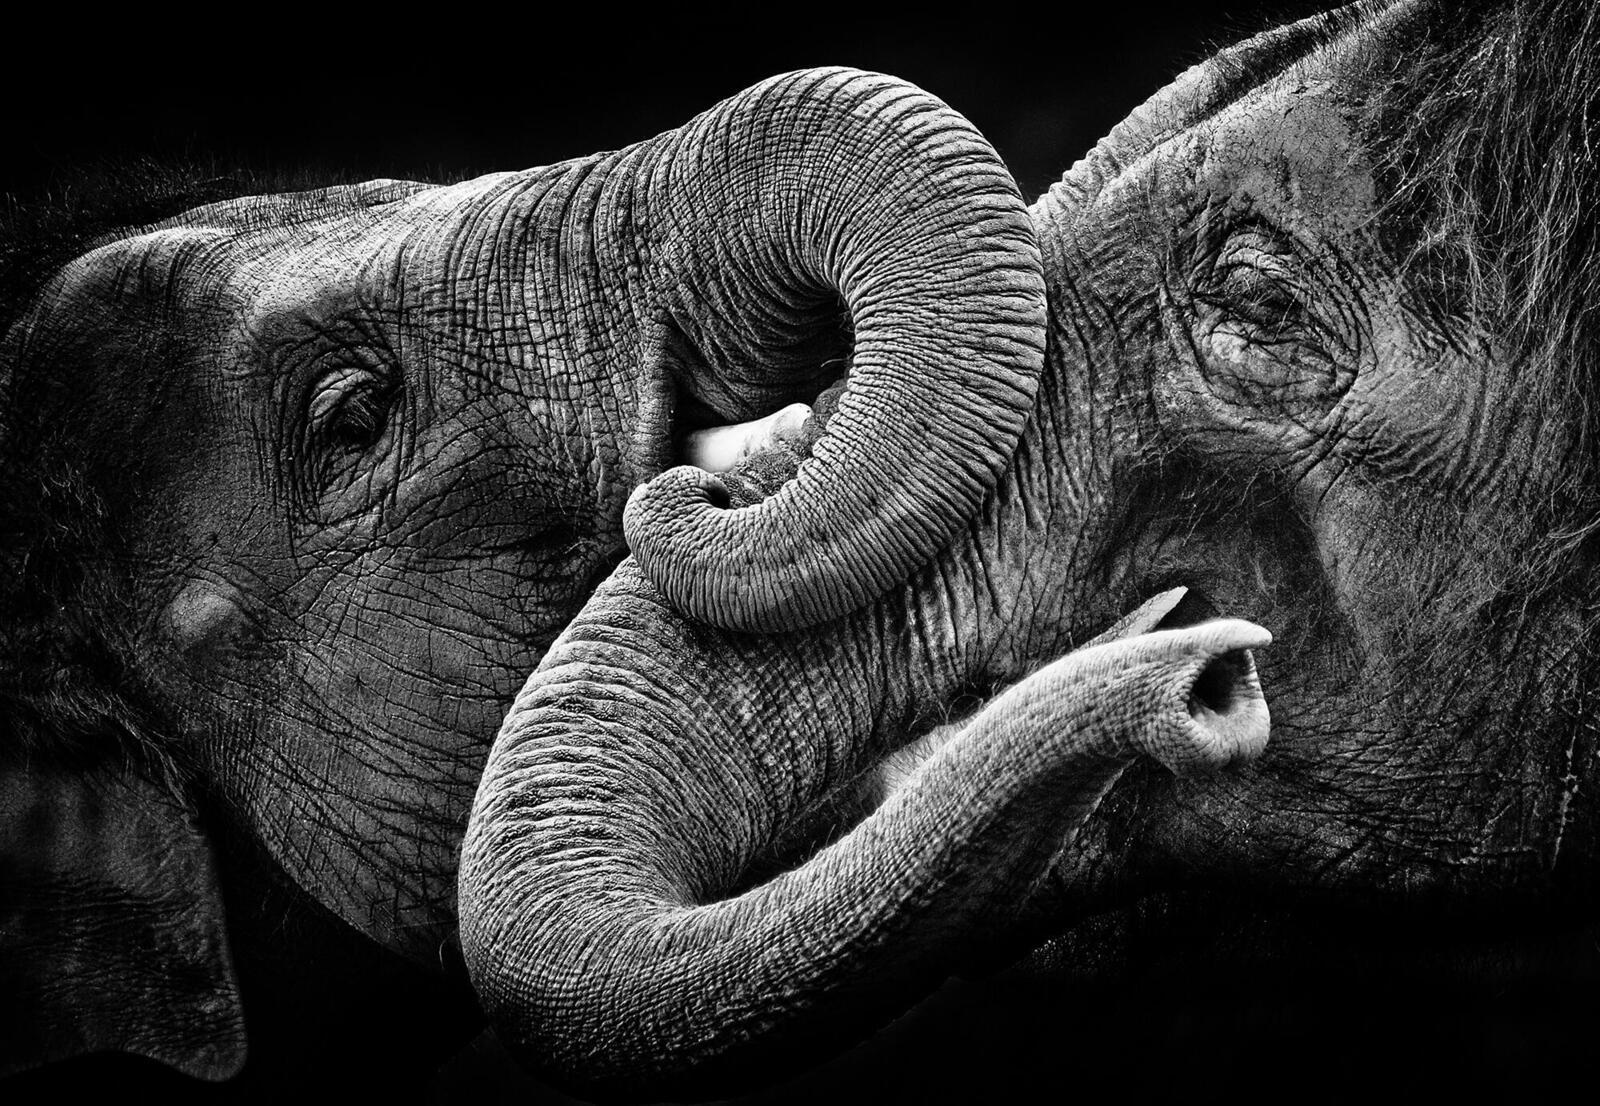 Two elephants interlocking trunk